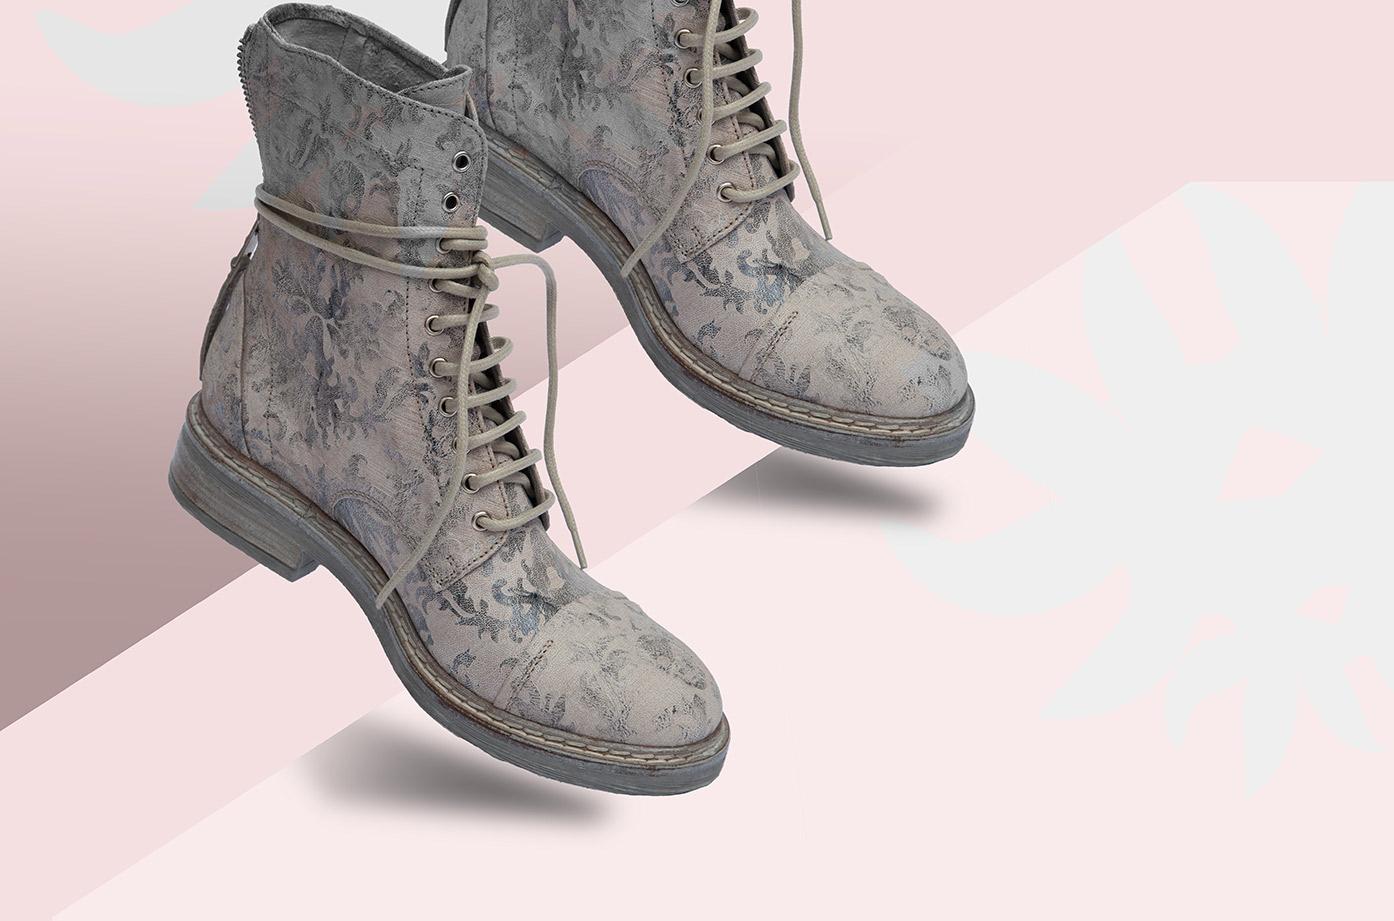 Creation-Illustration-Mode-Strada-Chaussures-Sophie-Jaton